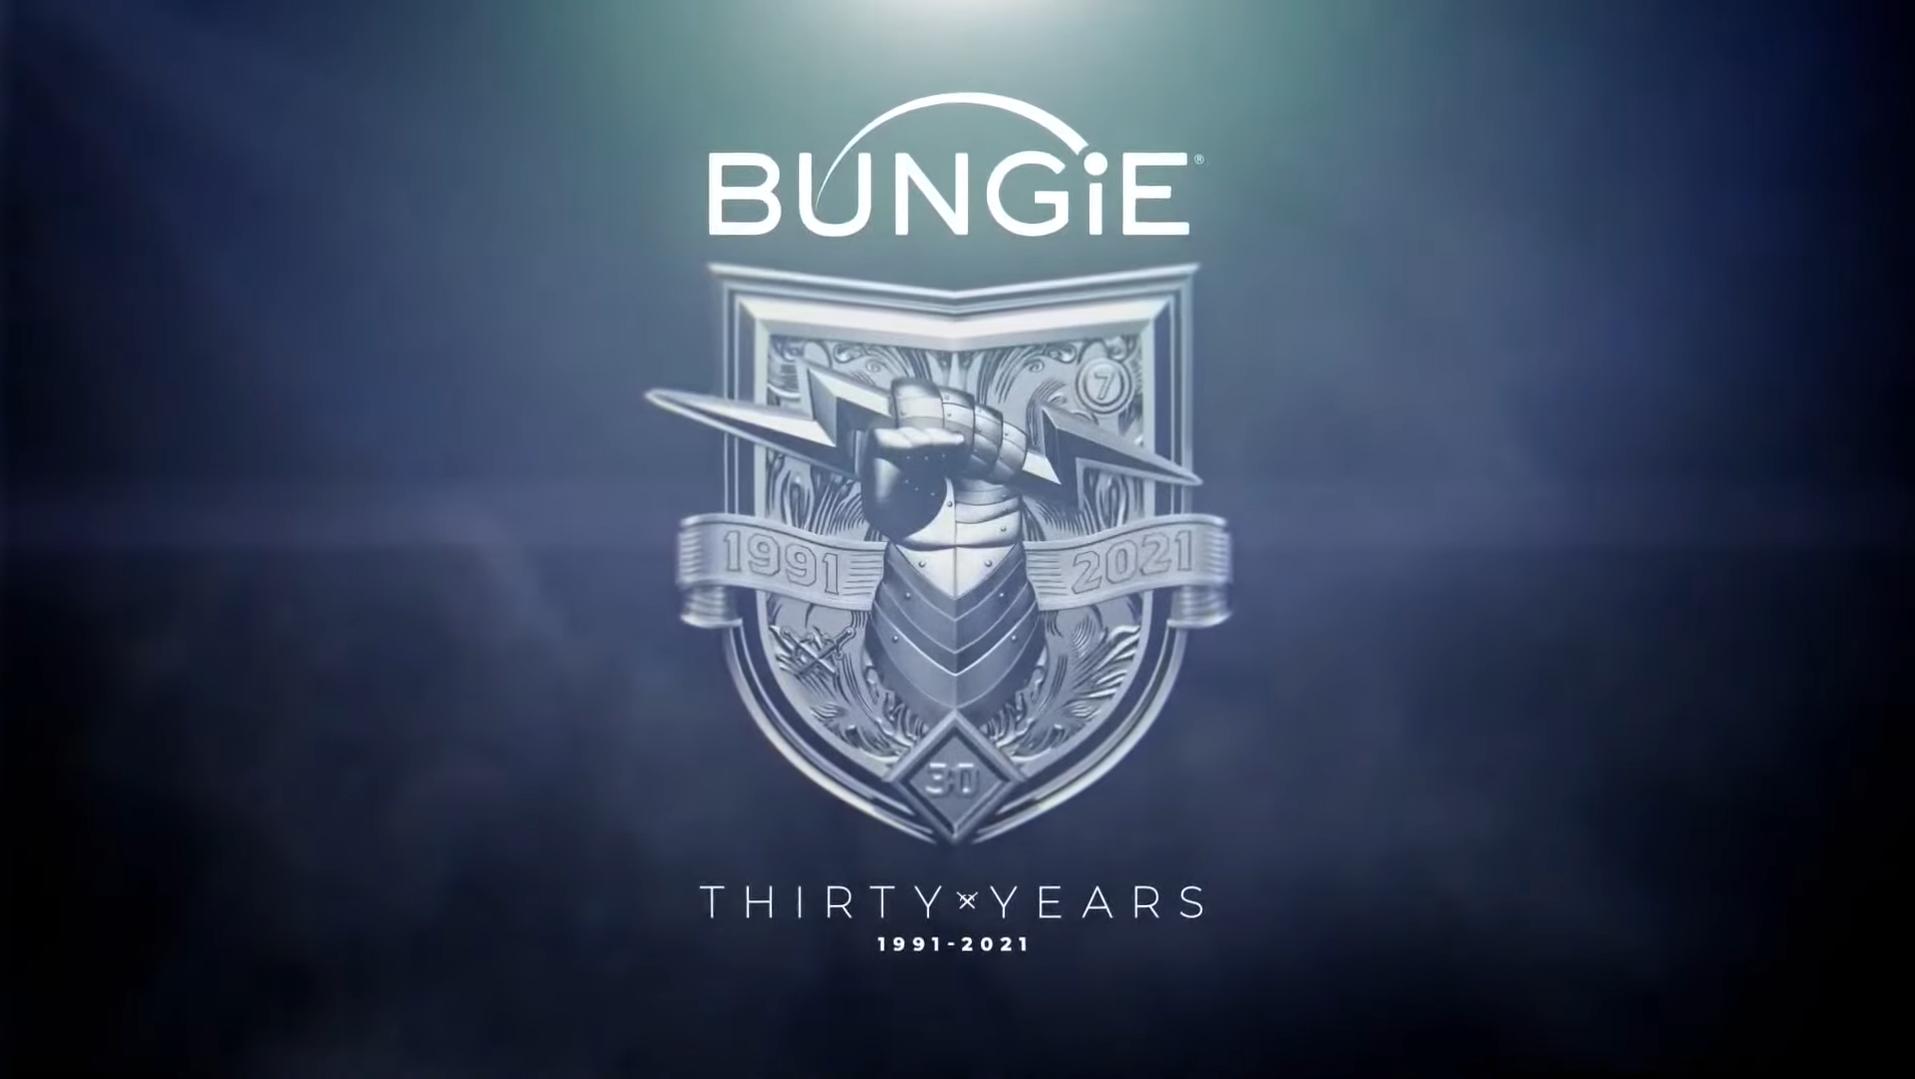 Bungie's 30th